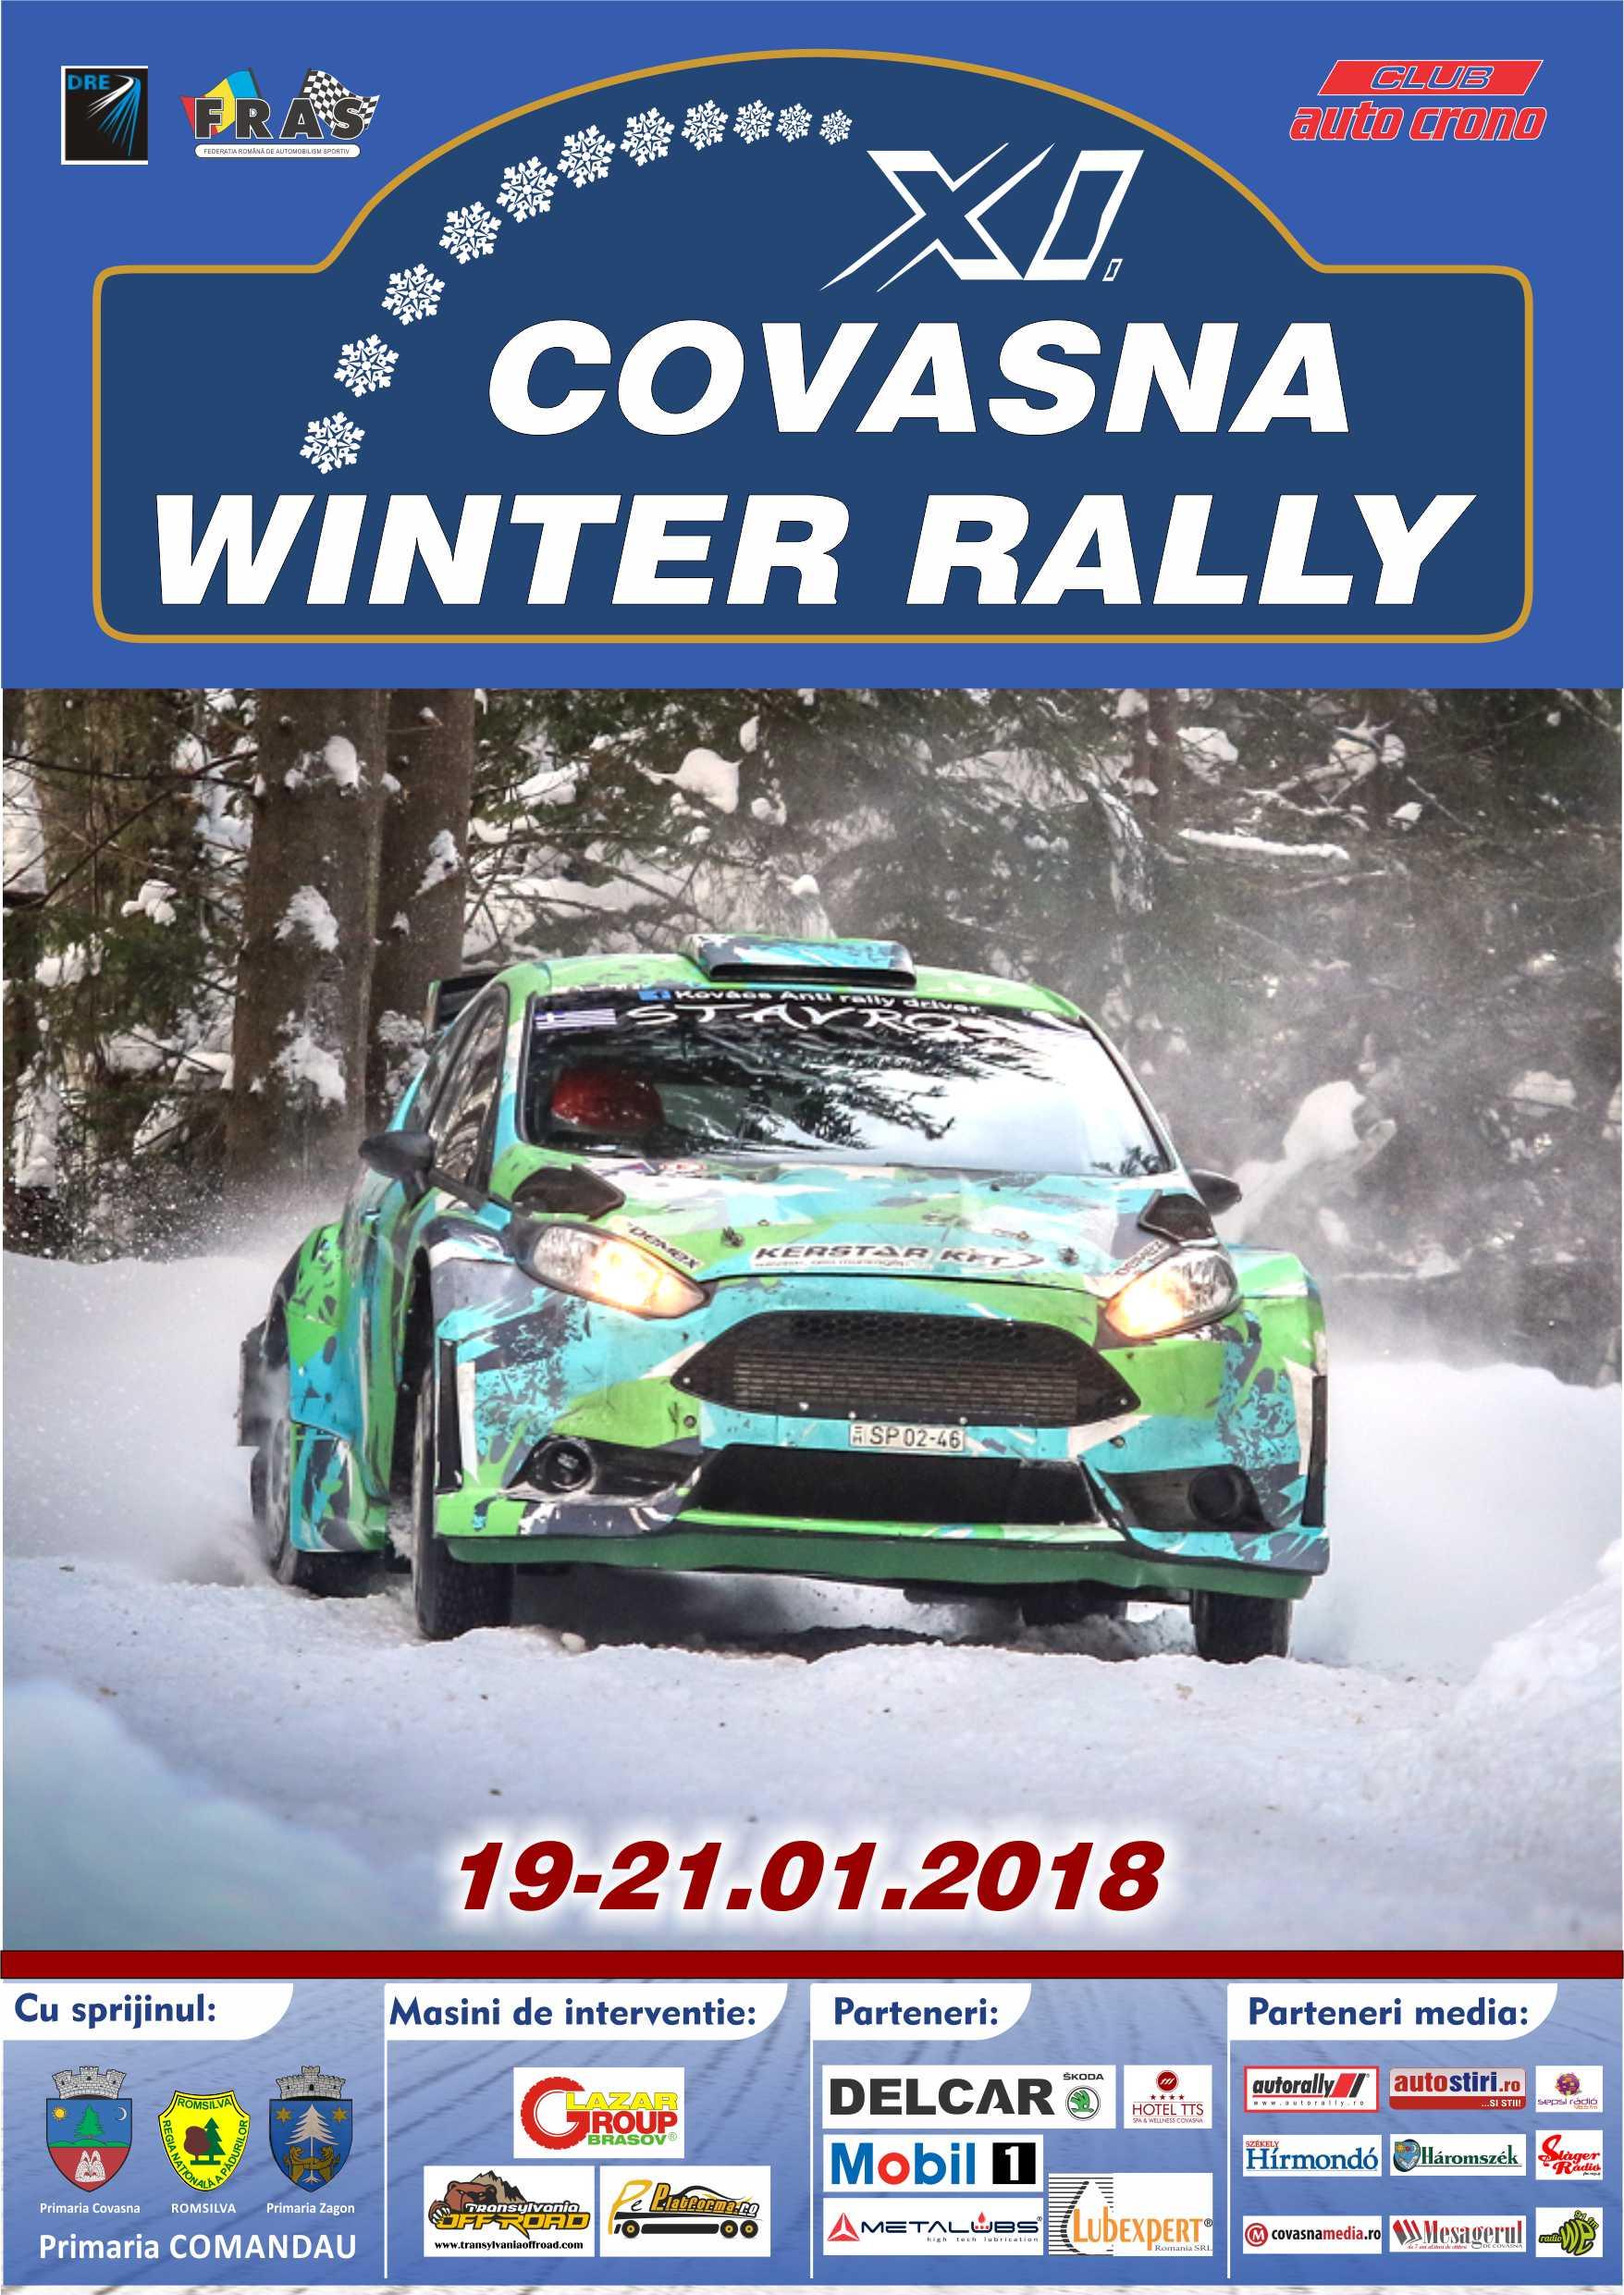 Winter Rally Covasna 2018 – Trofeul celor 3 Națiuni